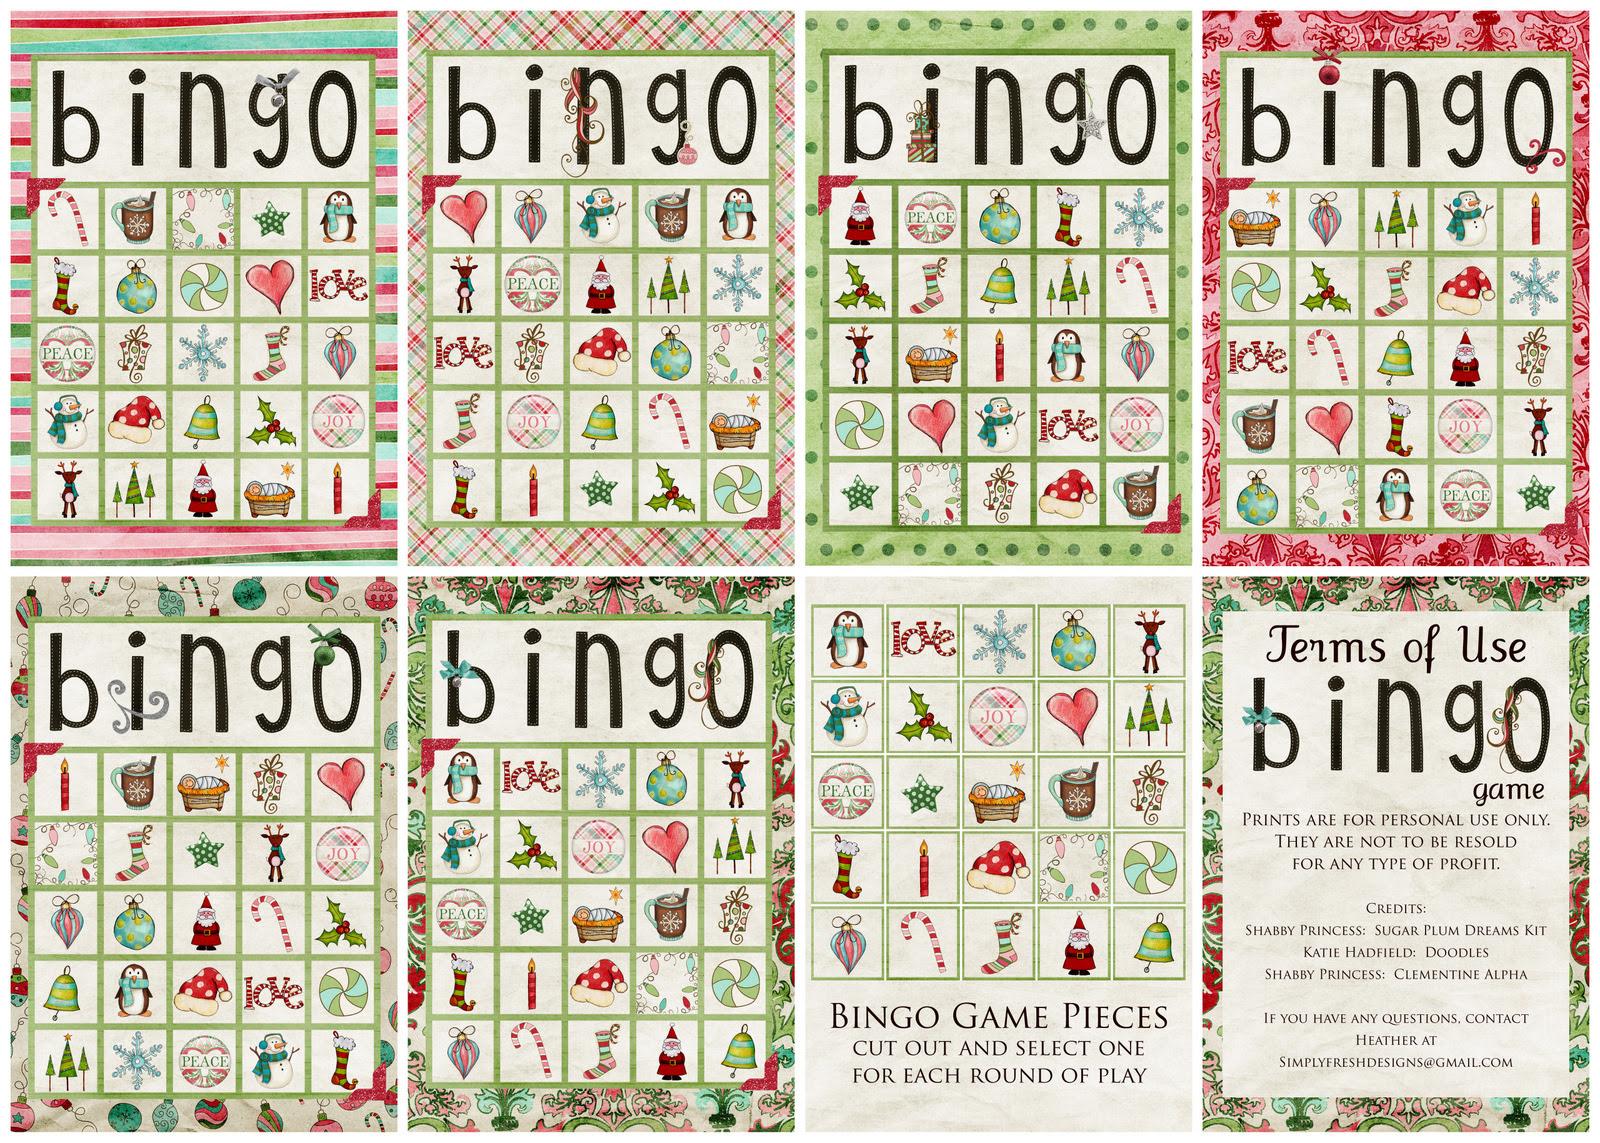 Bingo card print